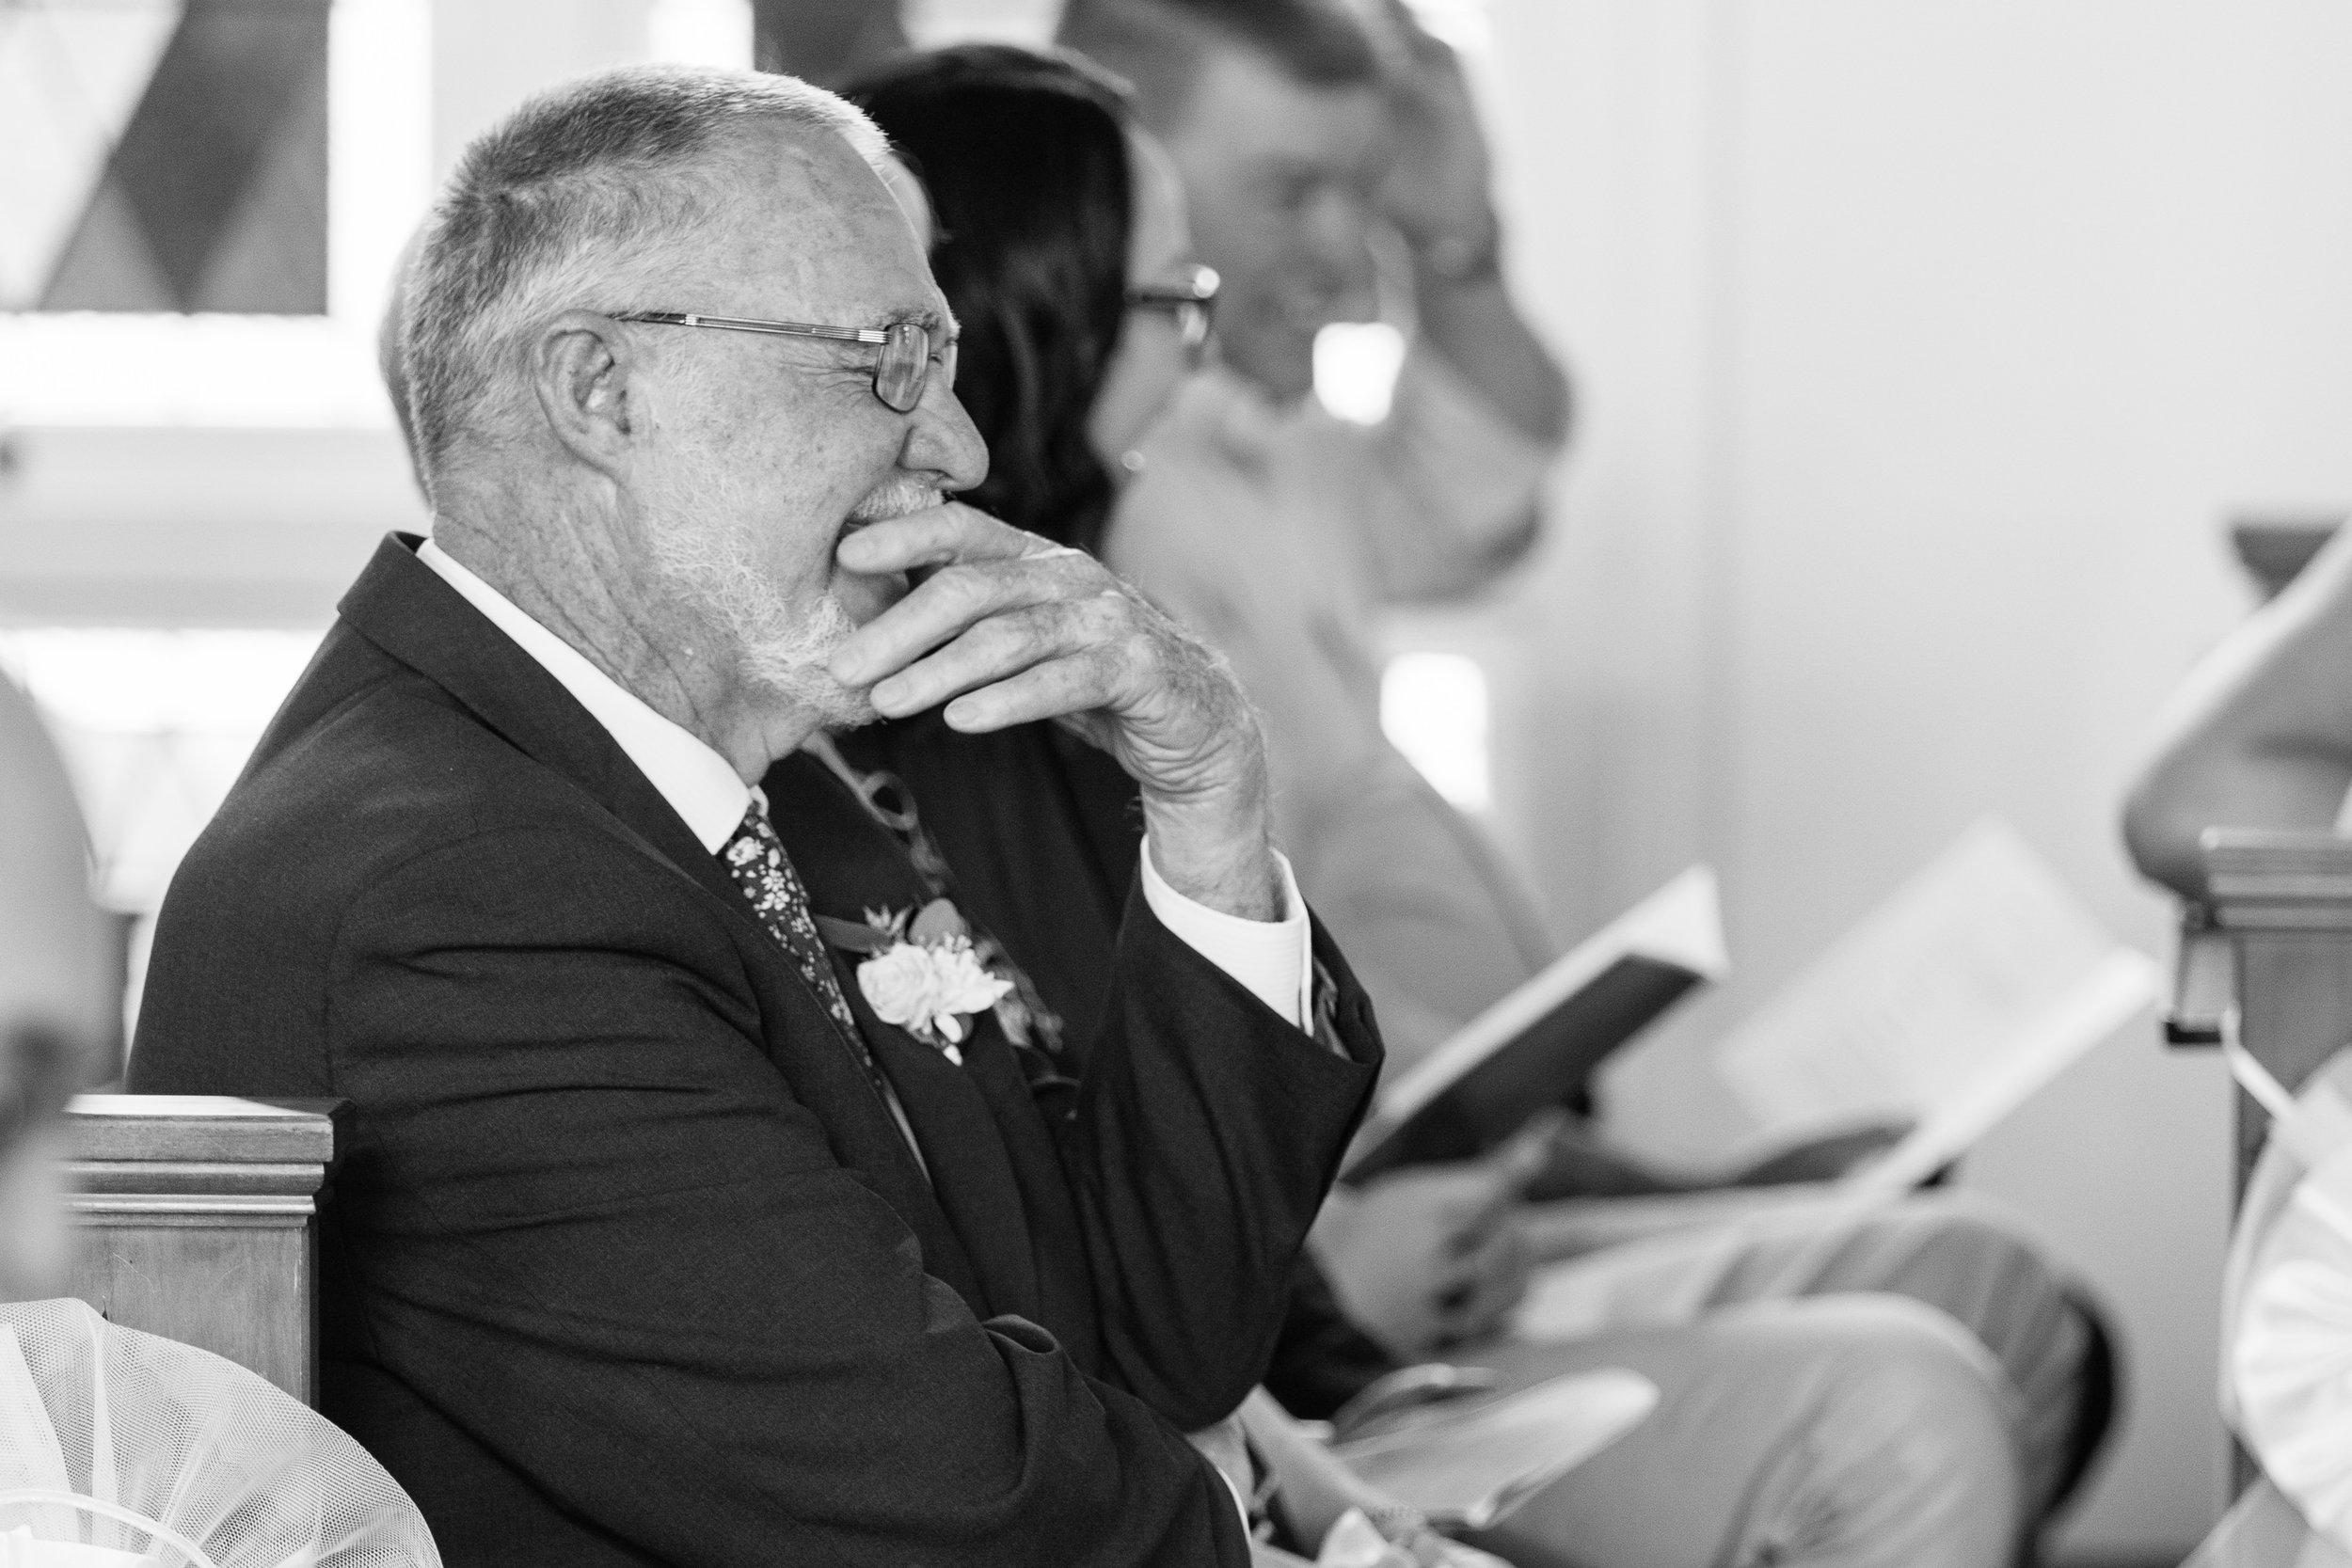 brisbane-city-wedding-photographer-romantic-wedding-35.jpg